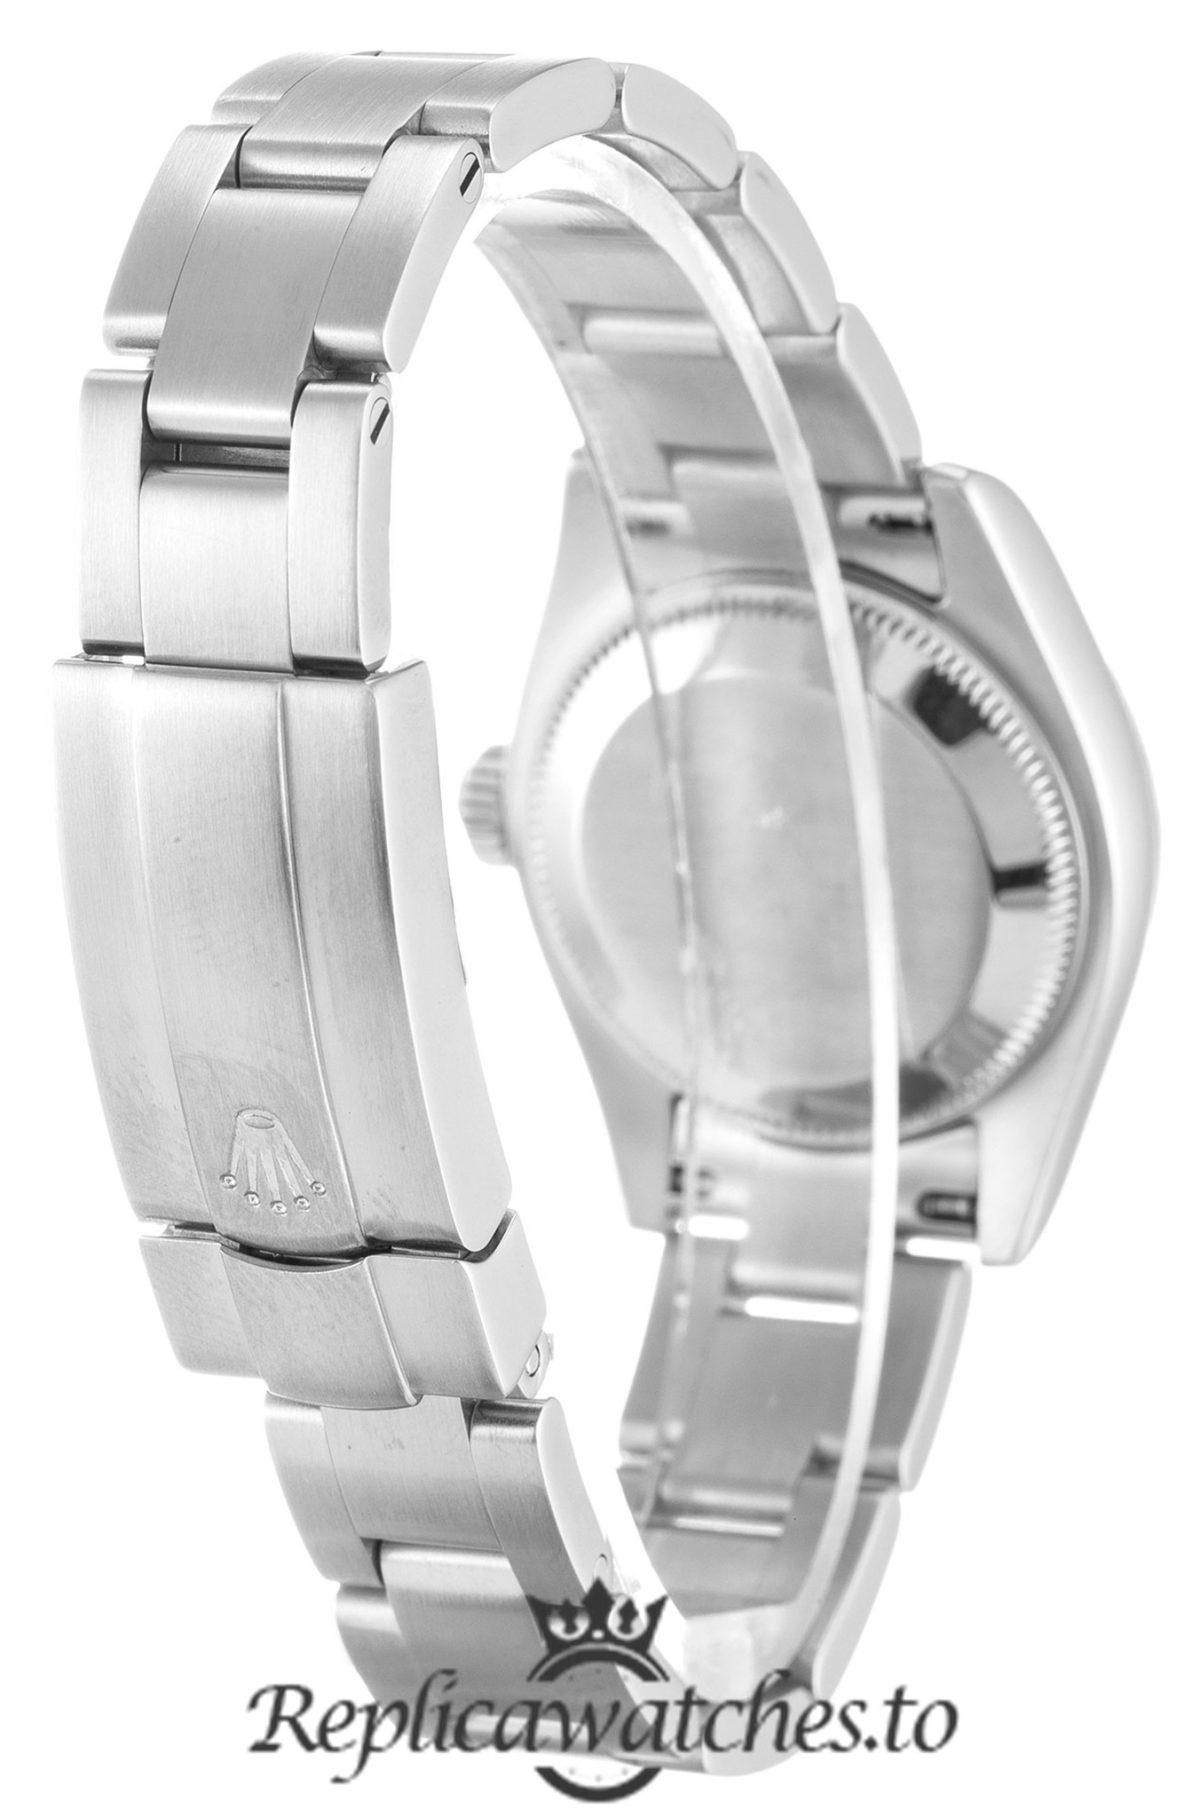 Rolex Oyster Perpetual Replica 176210 Silver Strap 26MM